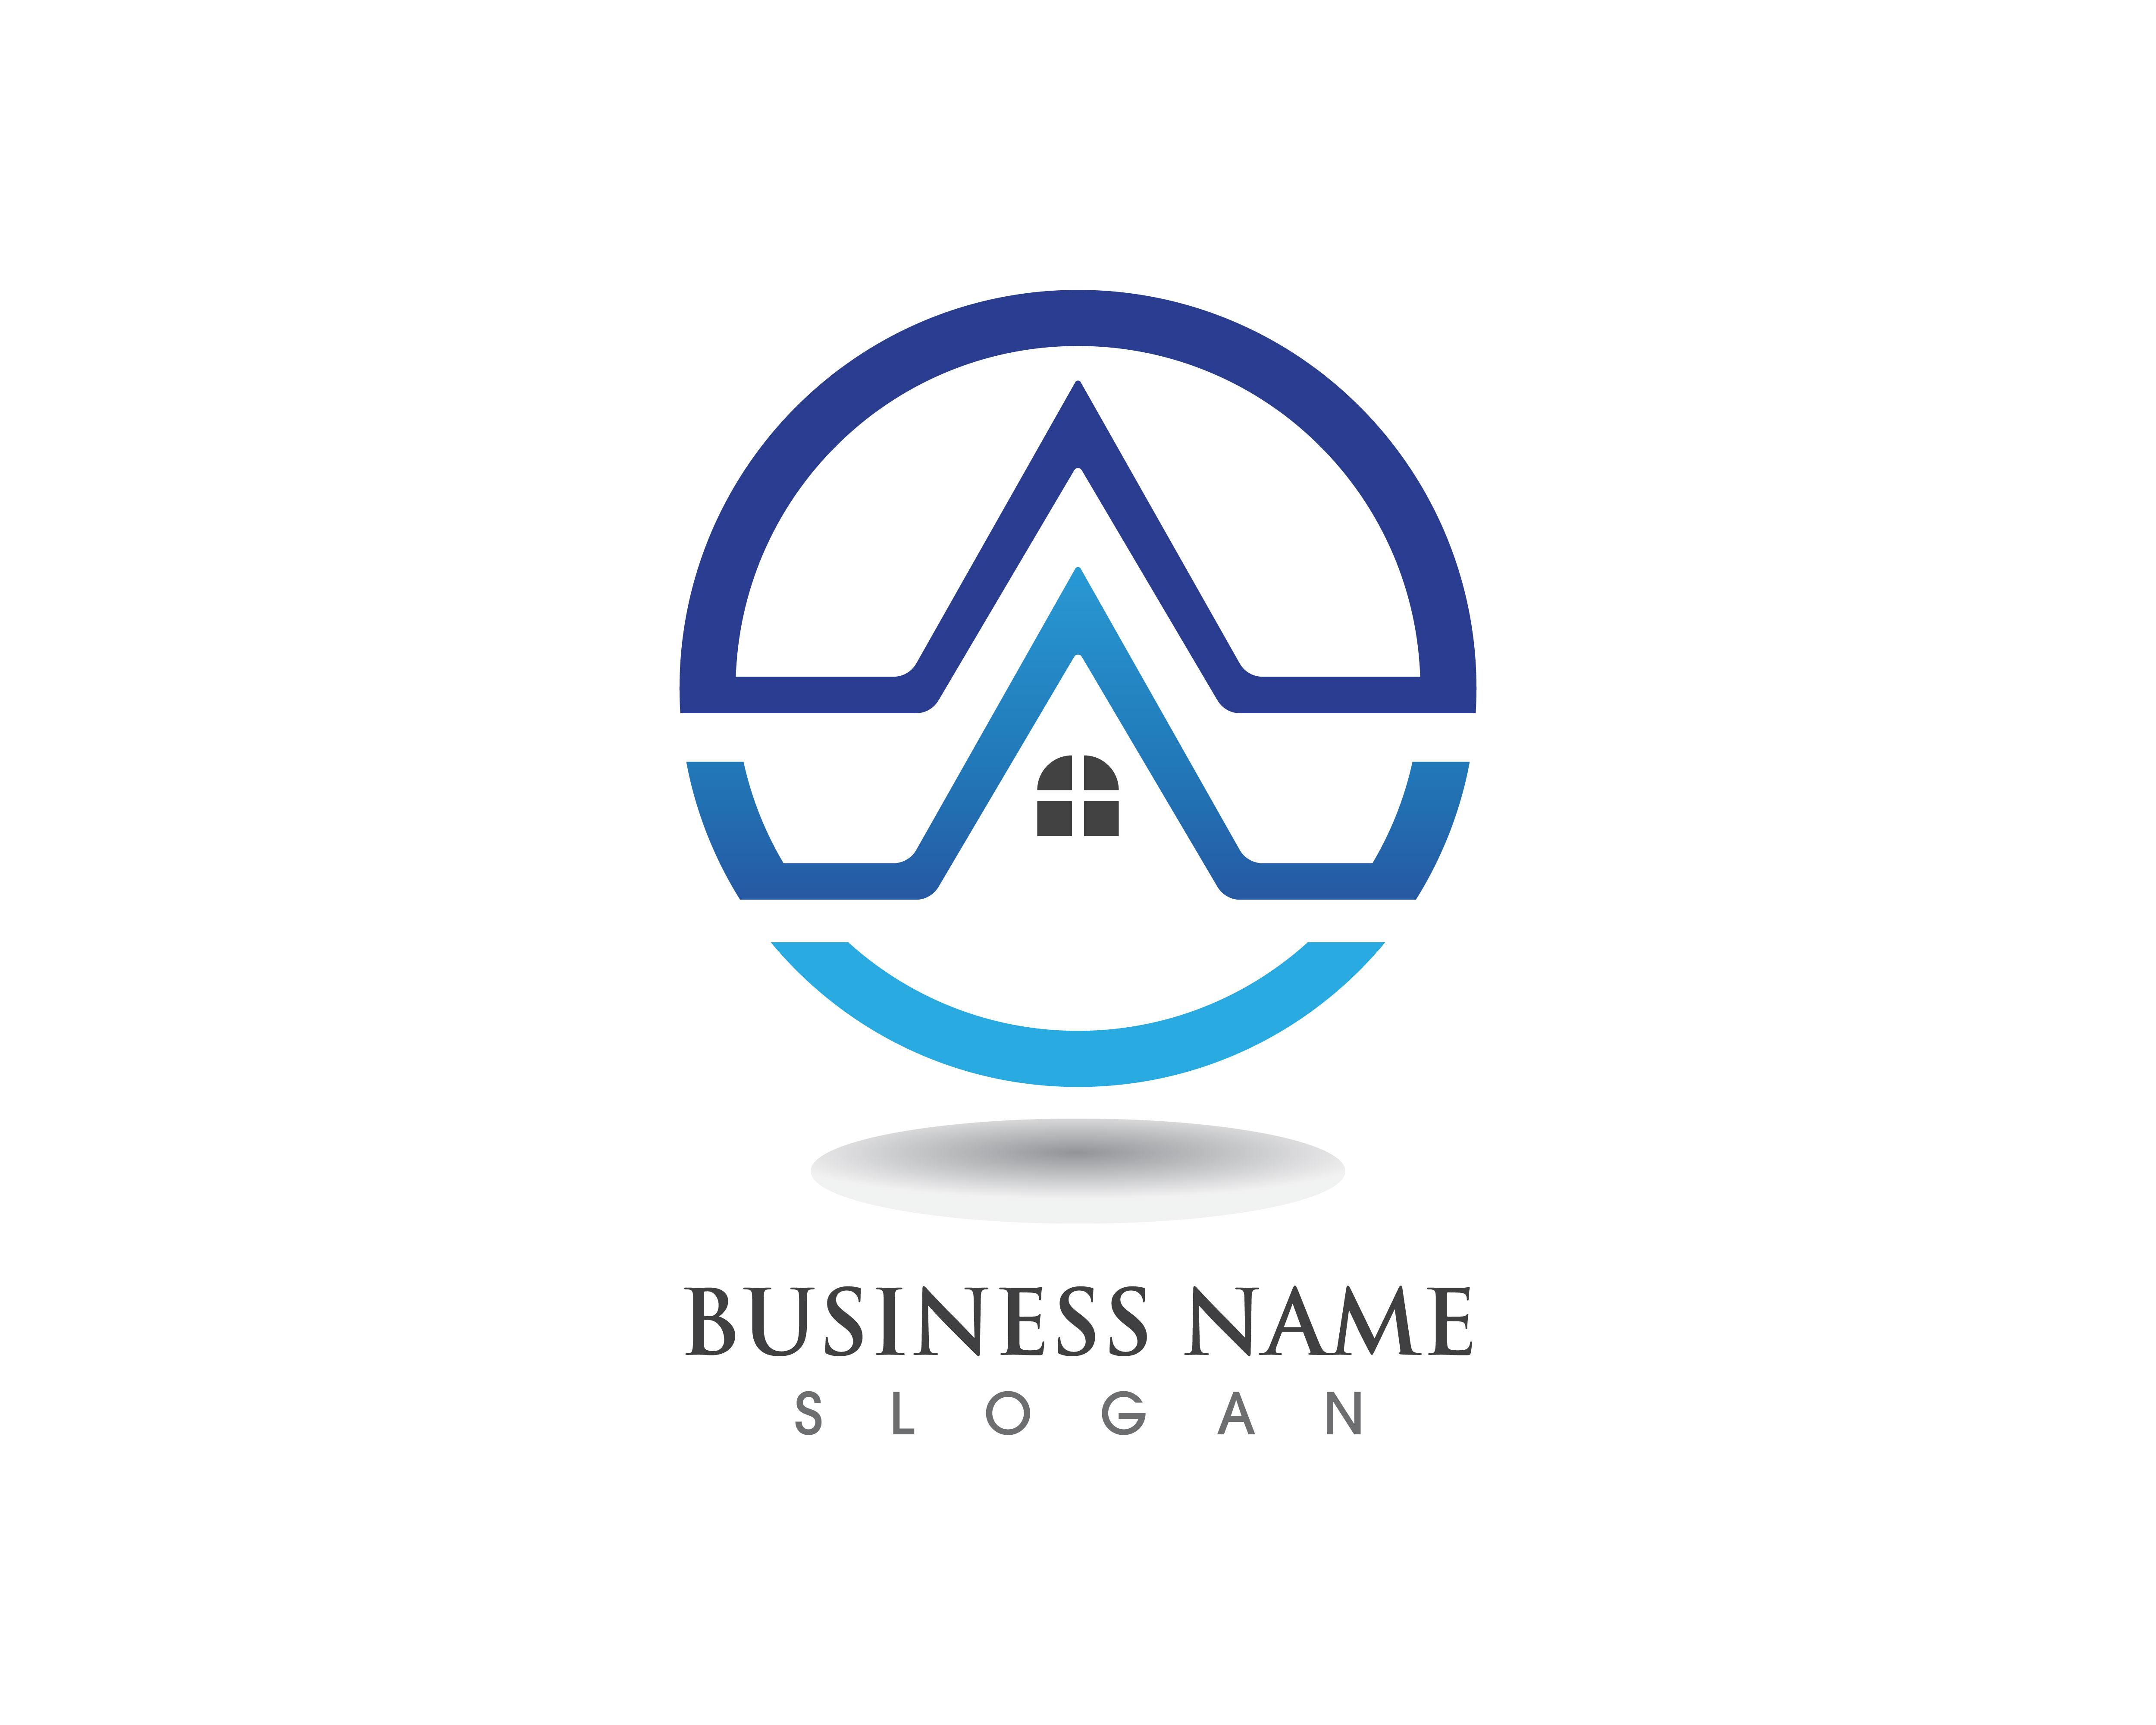 buildings logo and symbols icons template - Download Free Vectors, Clipart Graphics & Vector Art